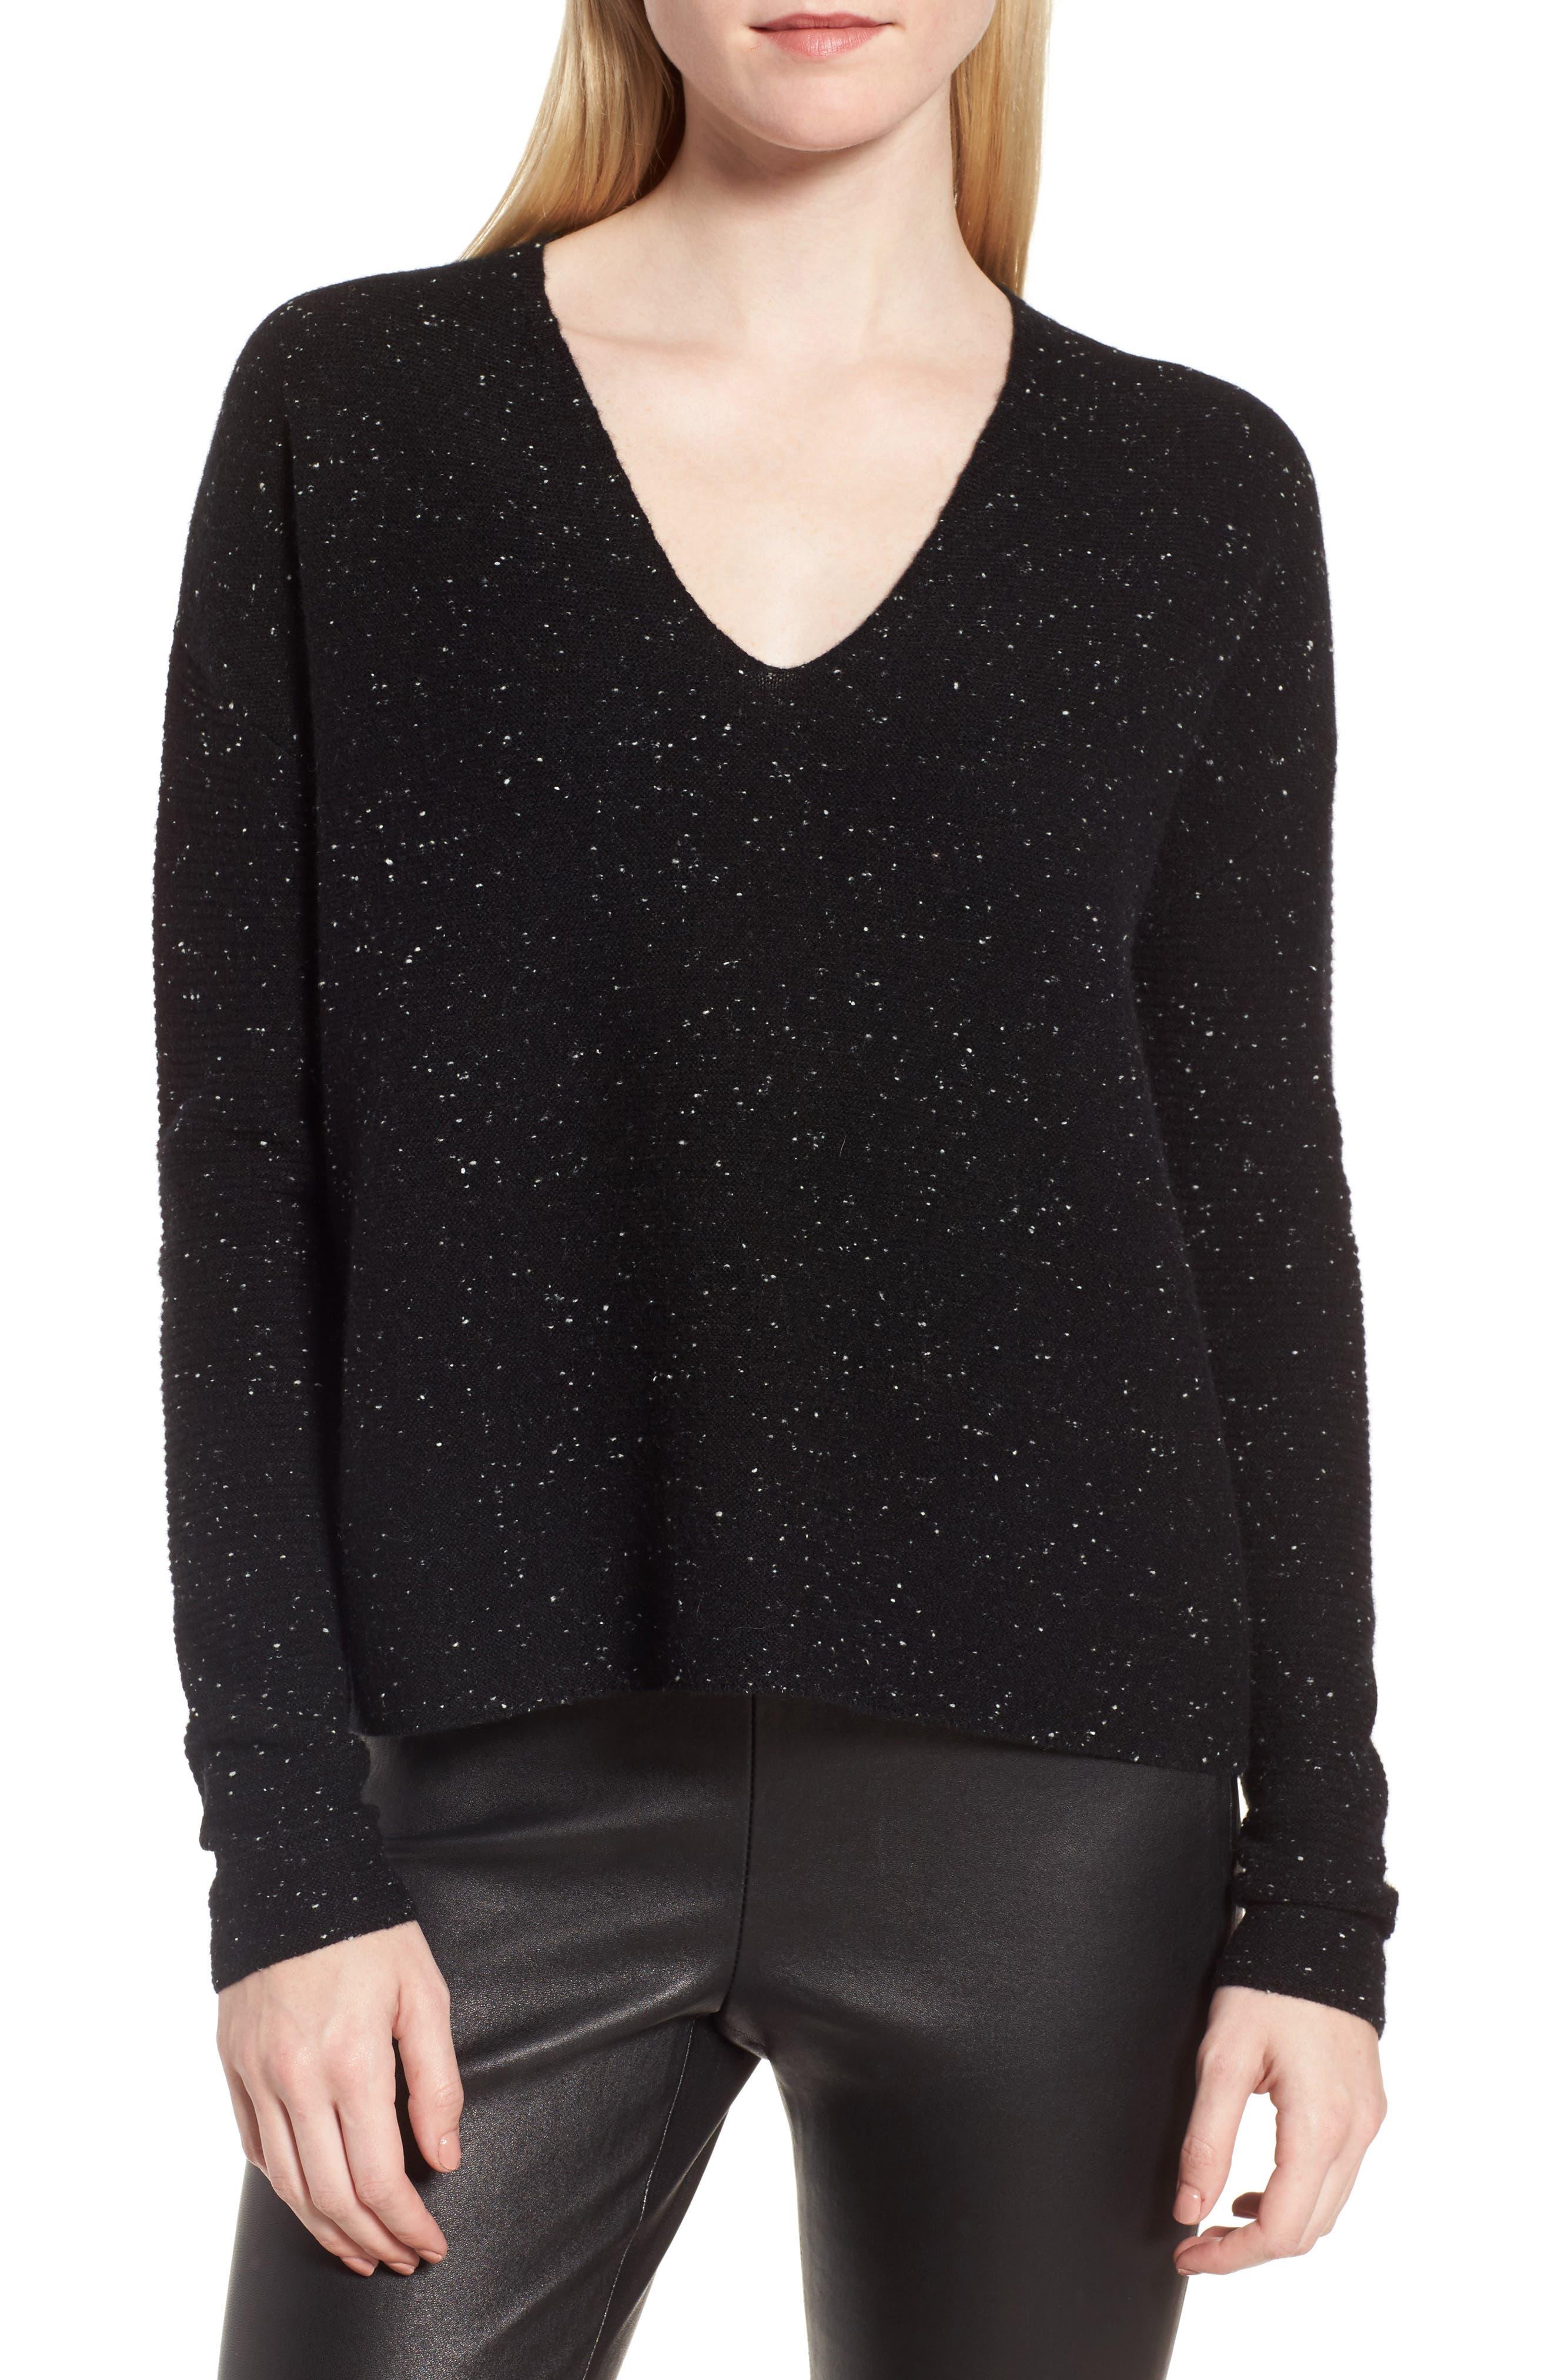 Nordstrom Signature Textured Cashmere V-Neck Sweater